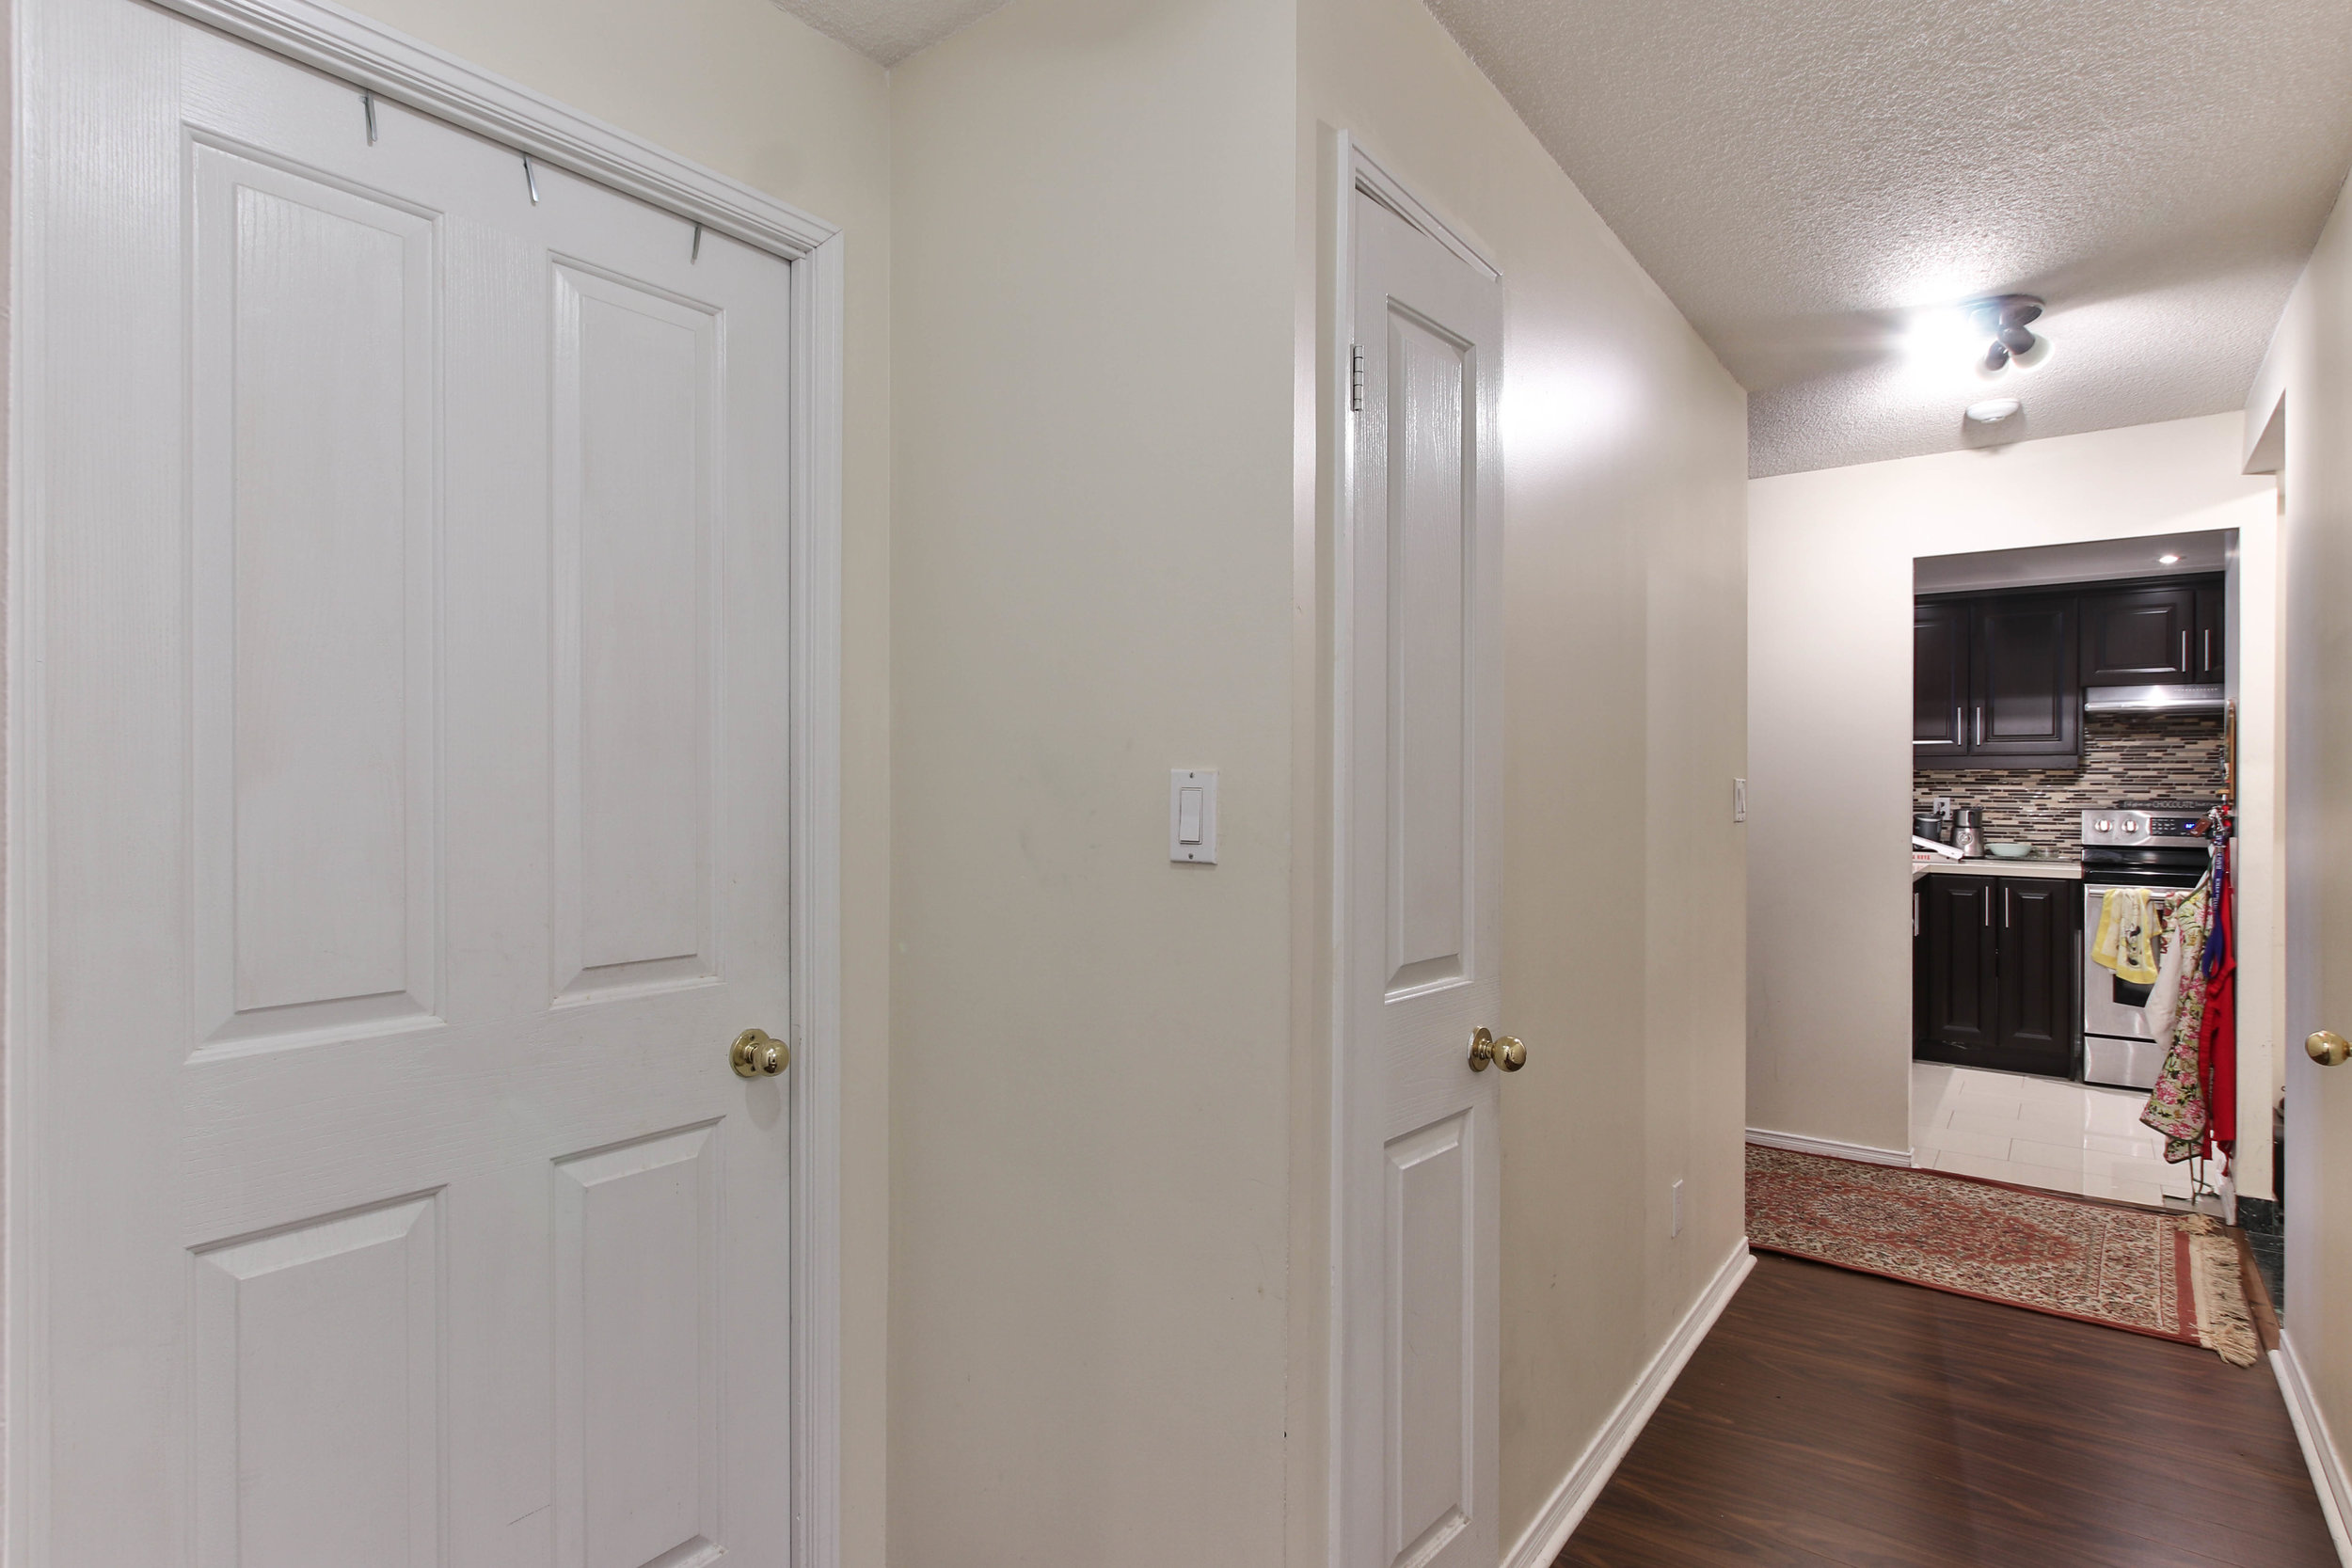 23_Hallway-3295.jpg